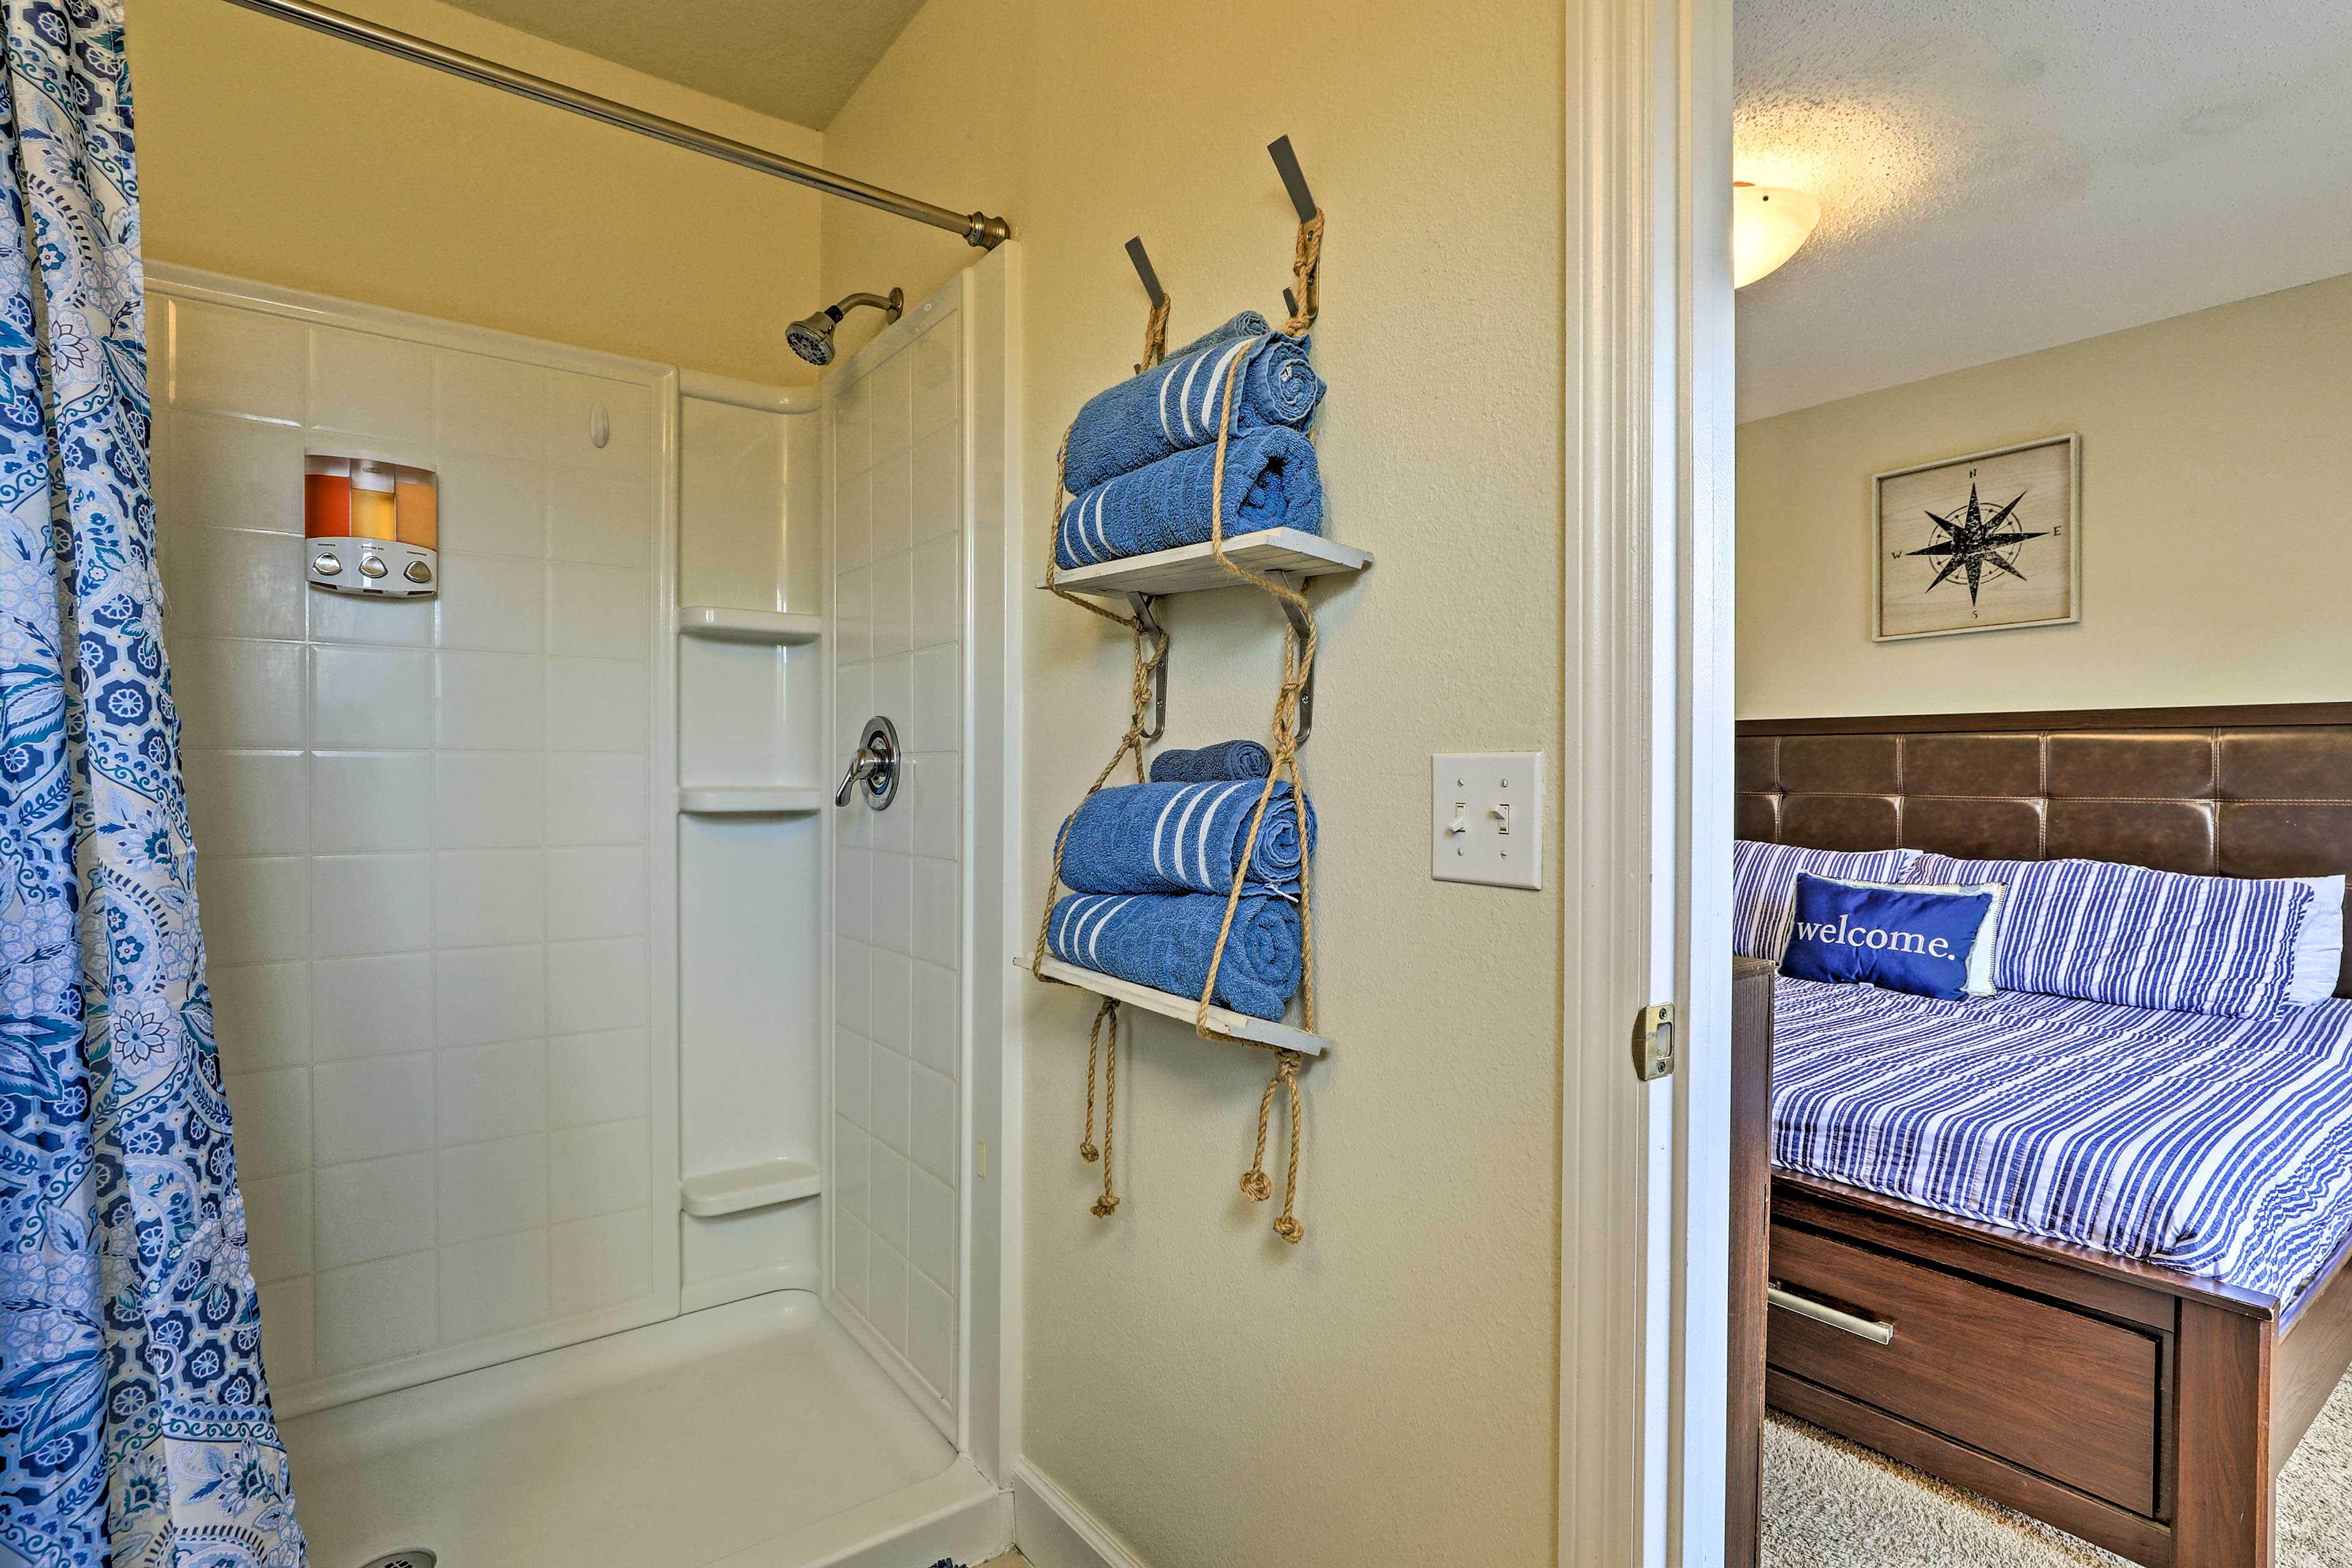 En-Suite Bathroom   Walk-In Shower   Towels Provided   Complimentary Toiletries